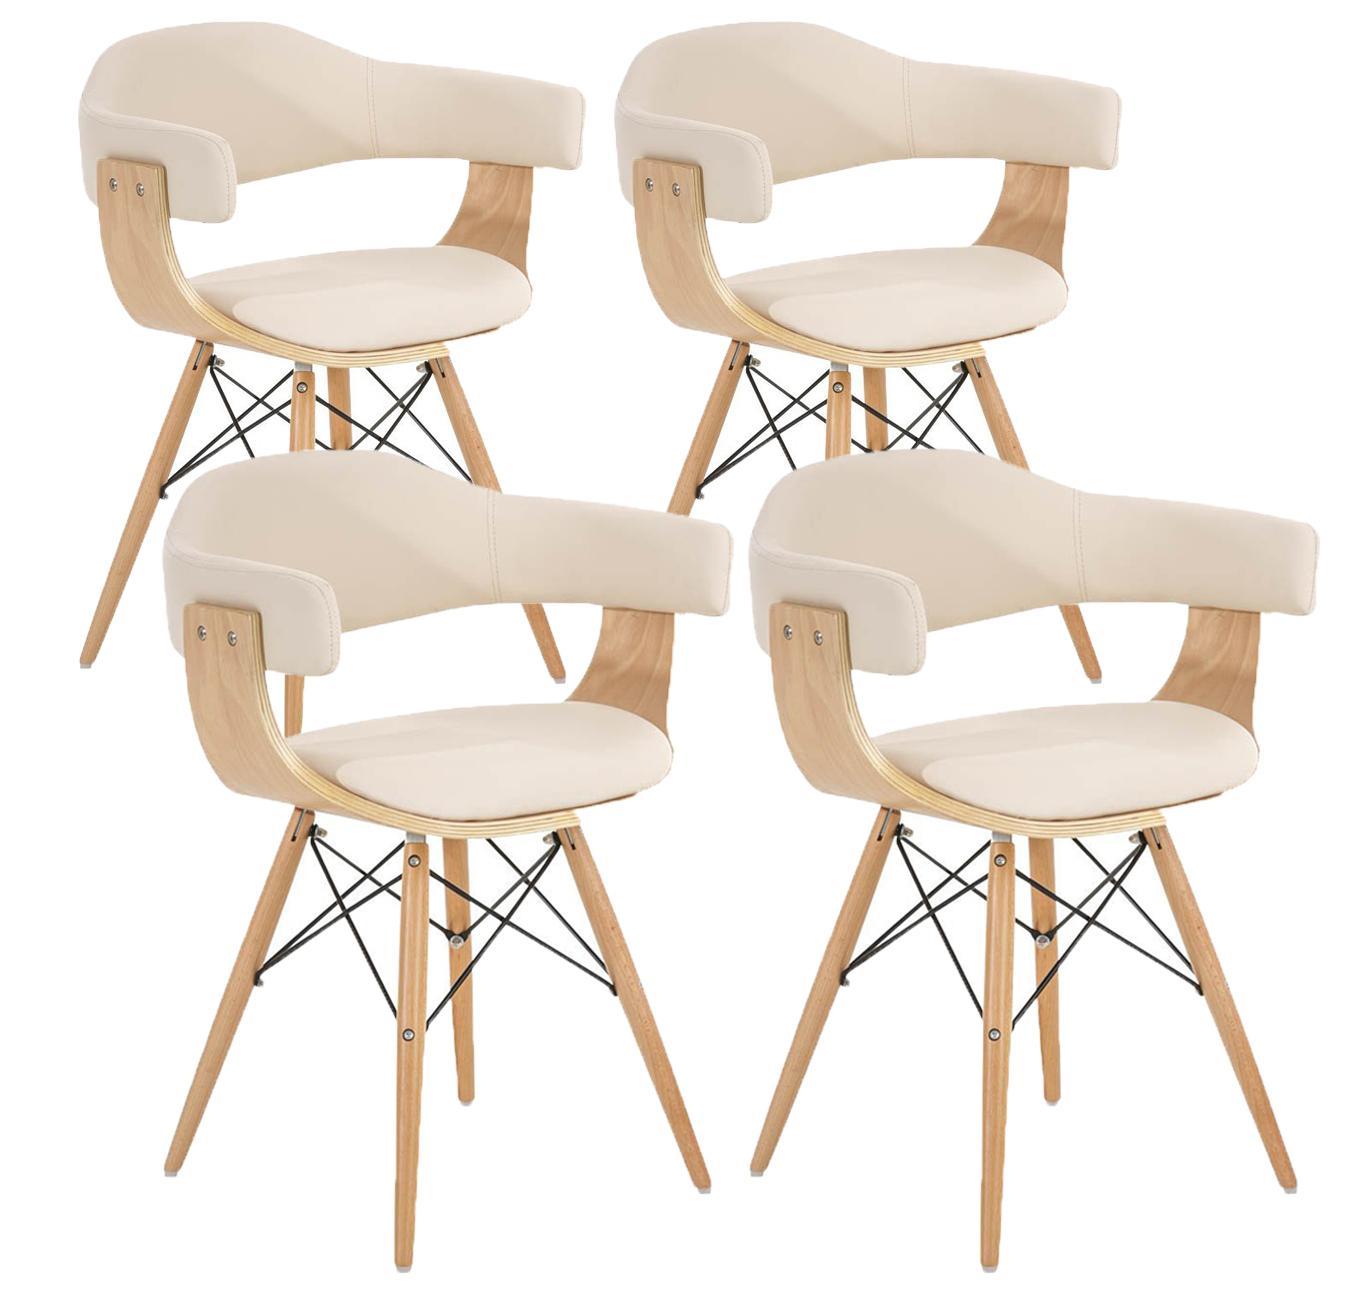 Lote 4 sillas barry precioso dise o moderno en madera y for Sillas de diseno moderno